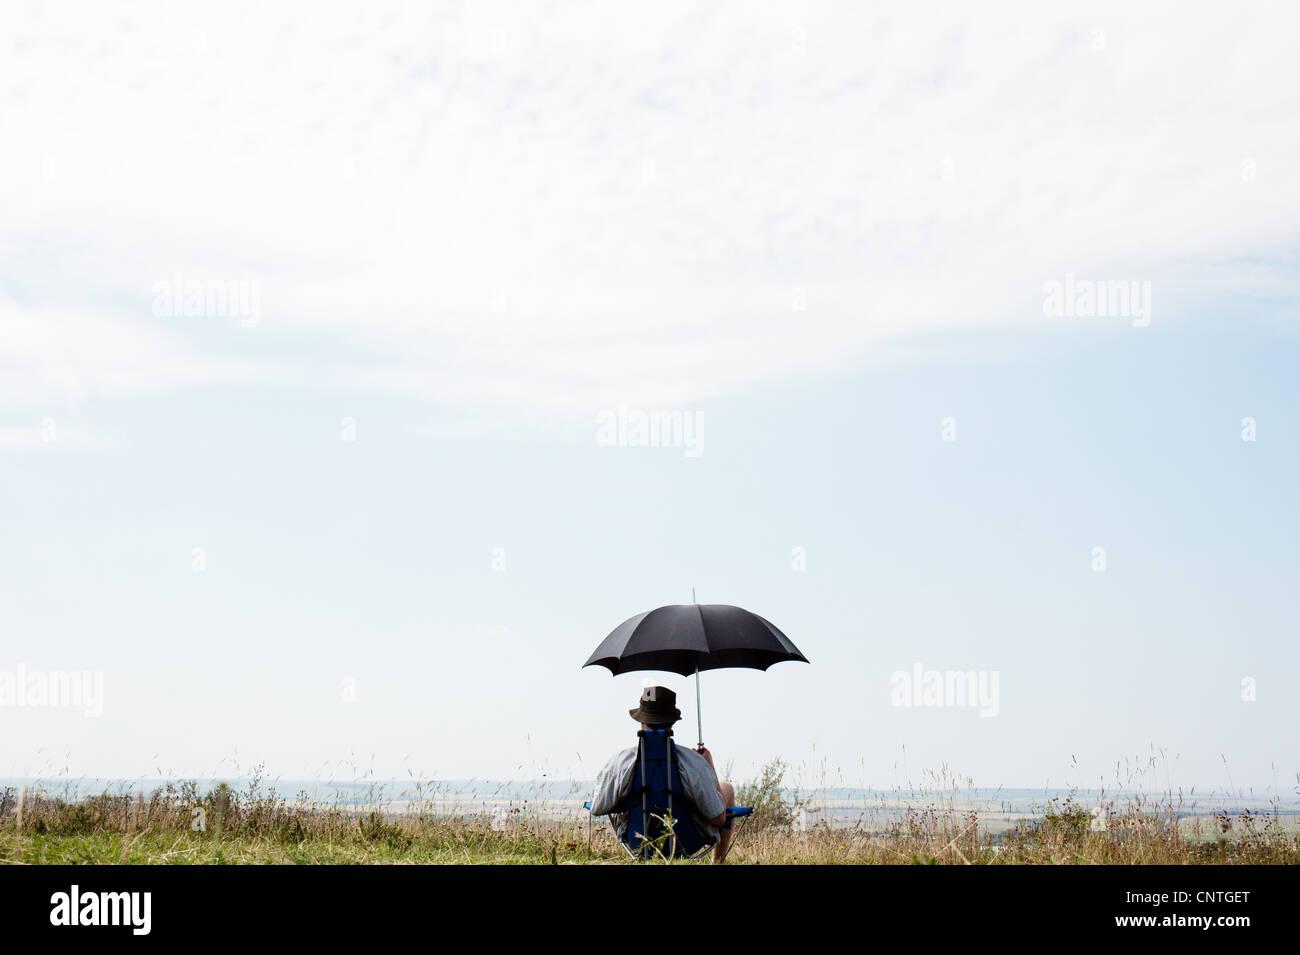 Man sitting under umbrella in field - Stock Image